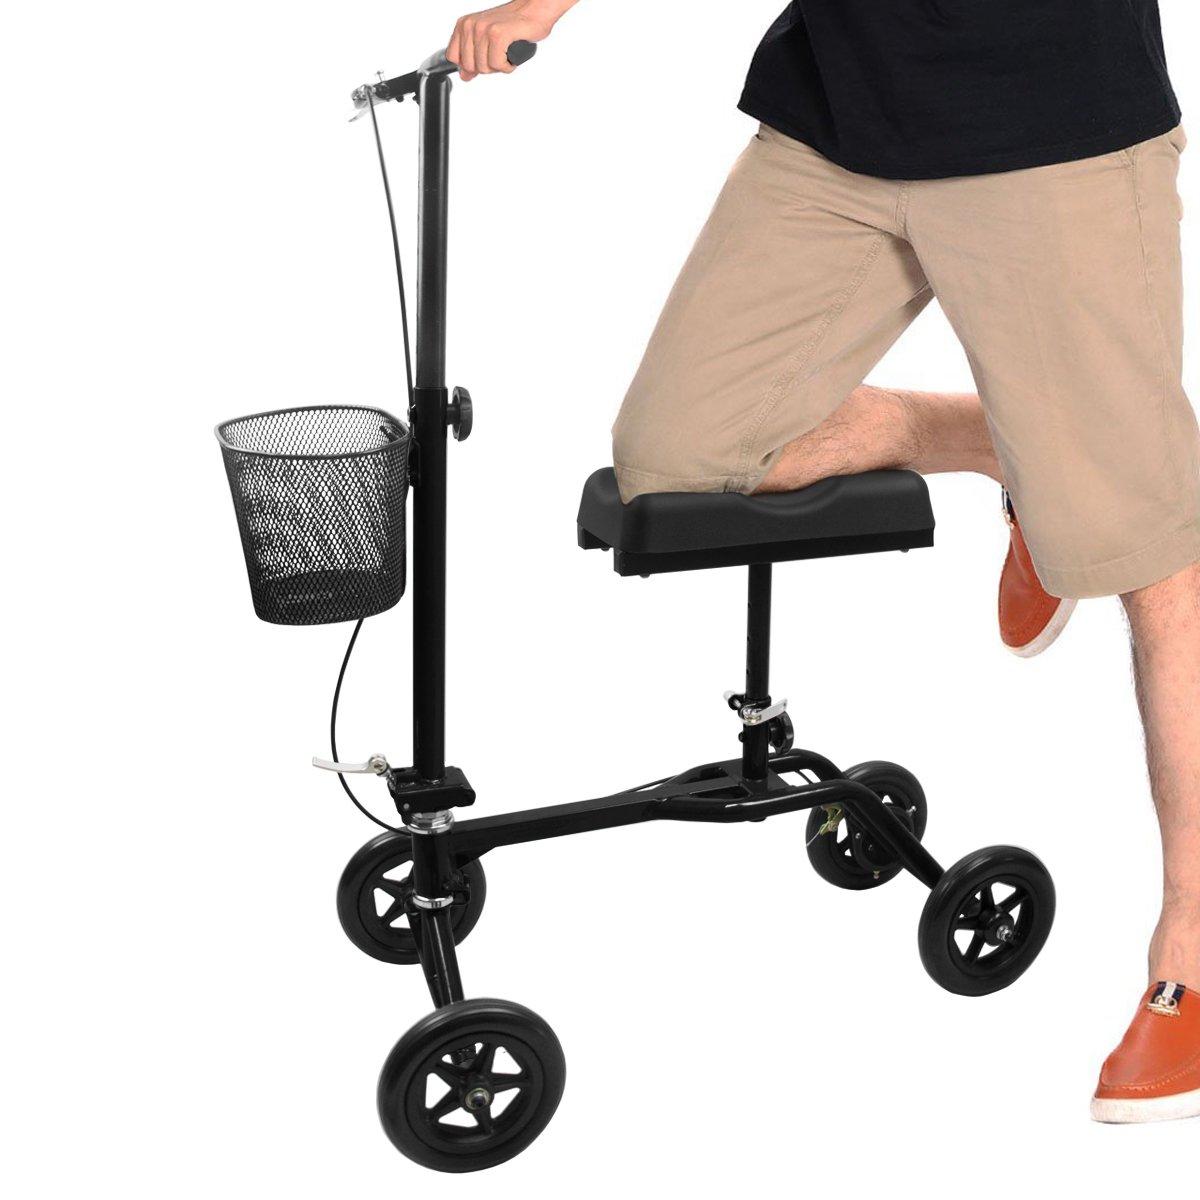 Steerable Knee Scooter Knee Roller Walker for Adult Broken Foot with Basket and Foot Cover (Black)